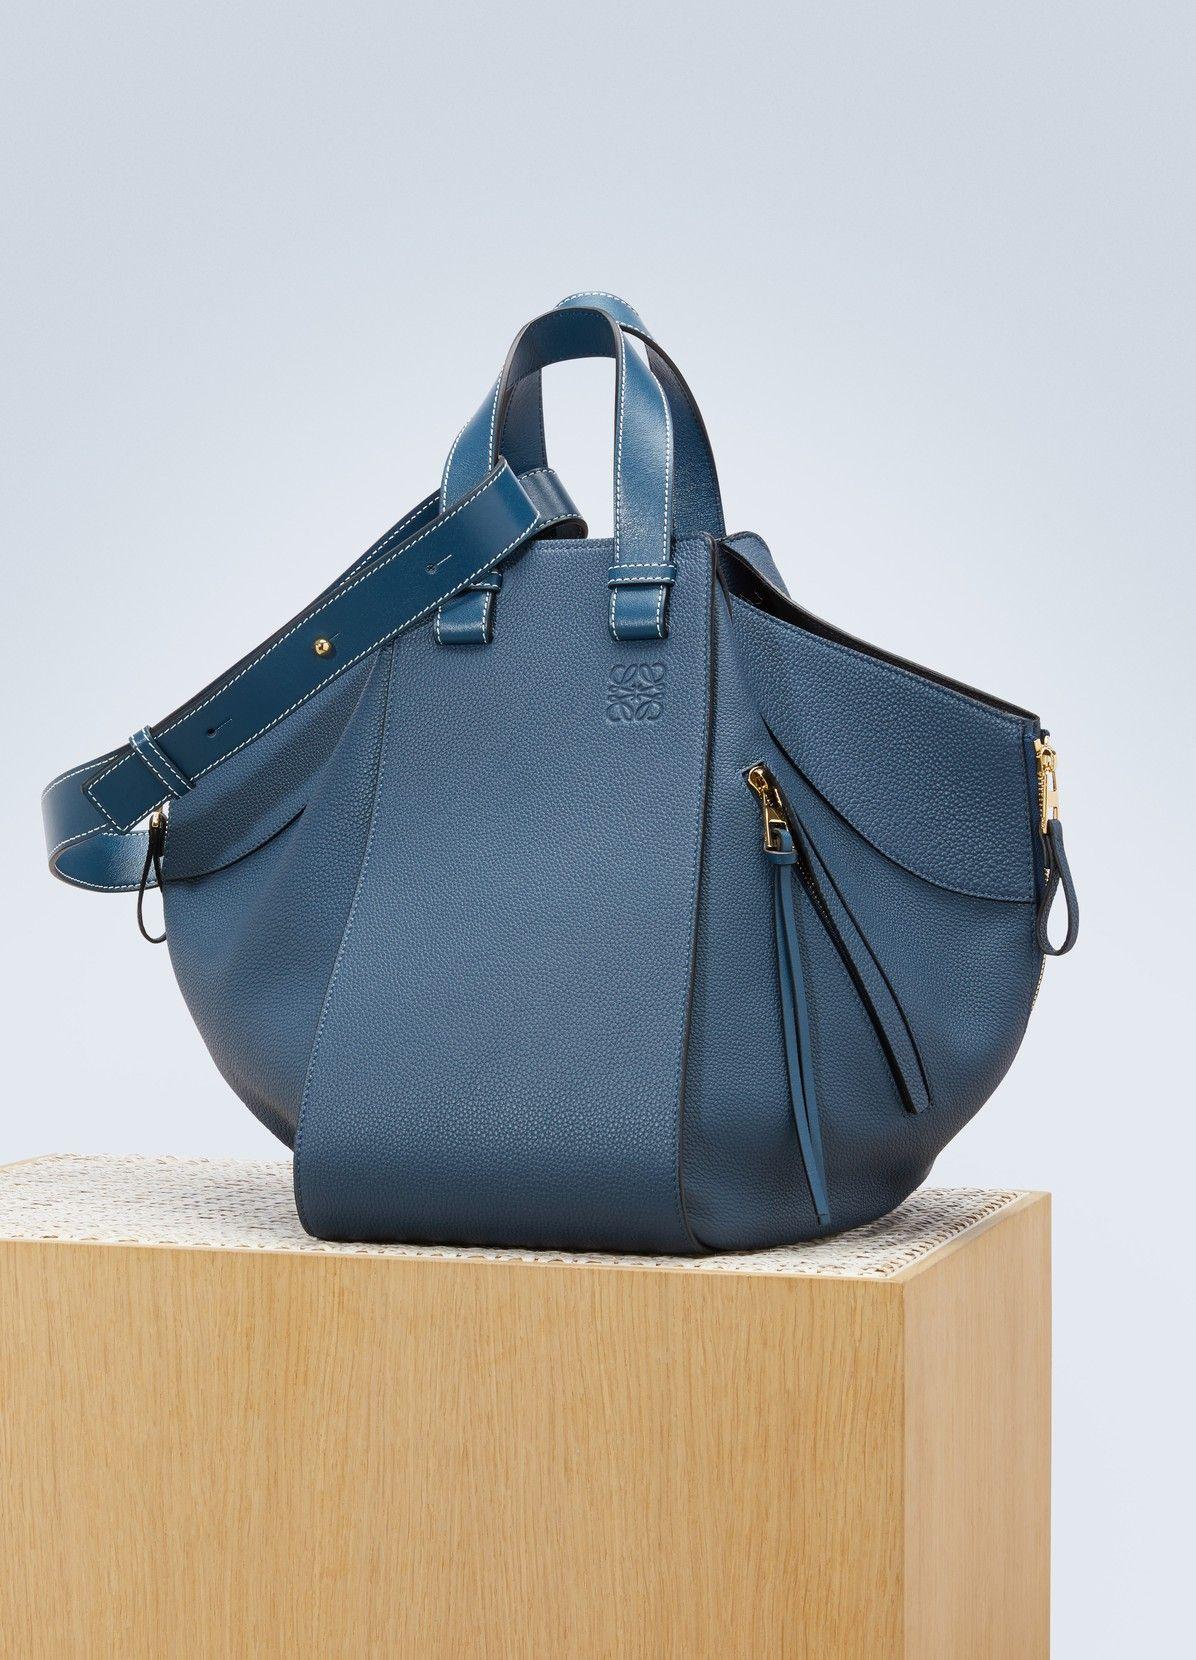 5f59b4bc70b4 LOEWE Hammock bag